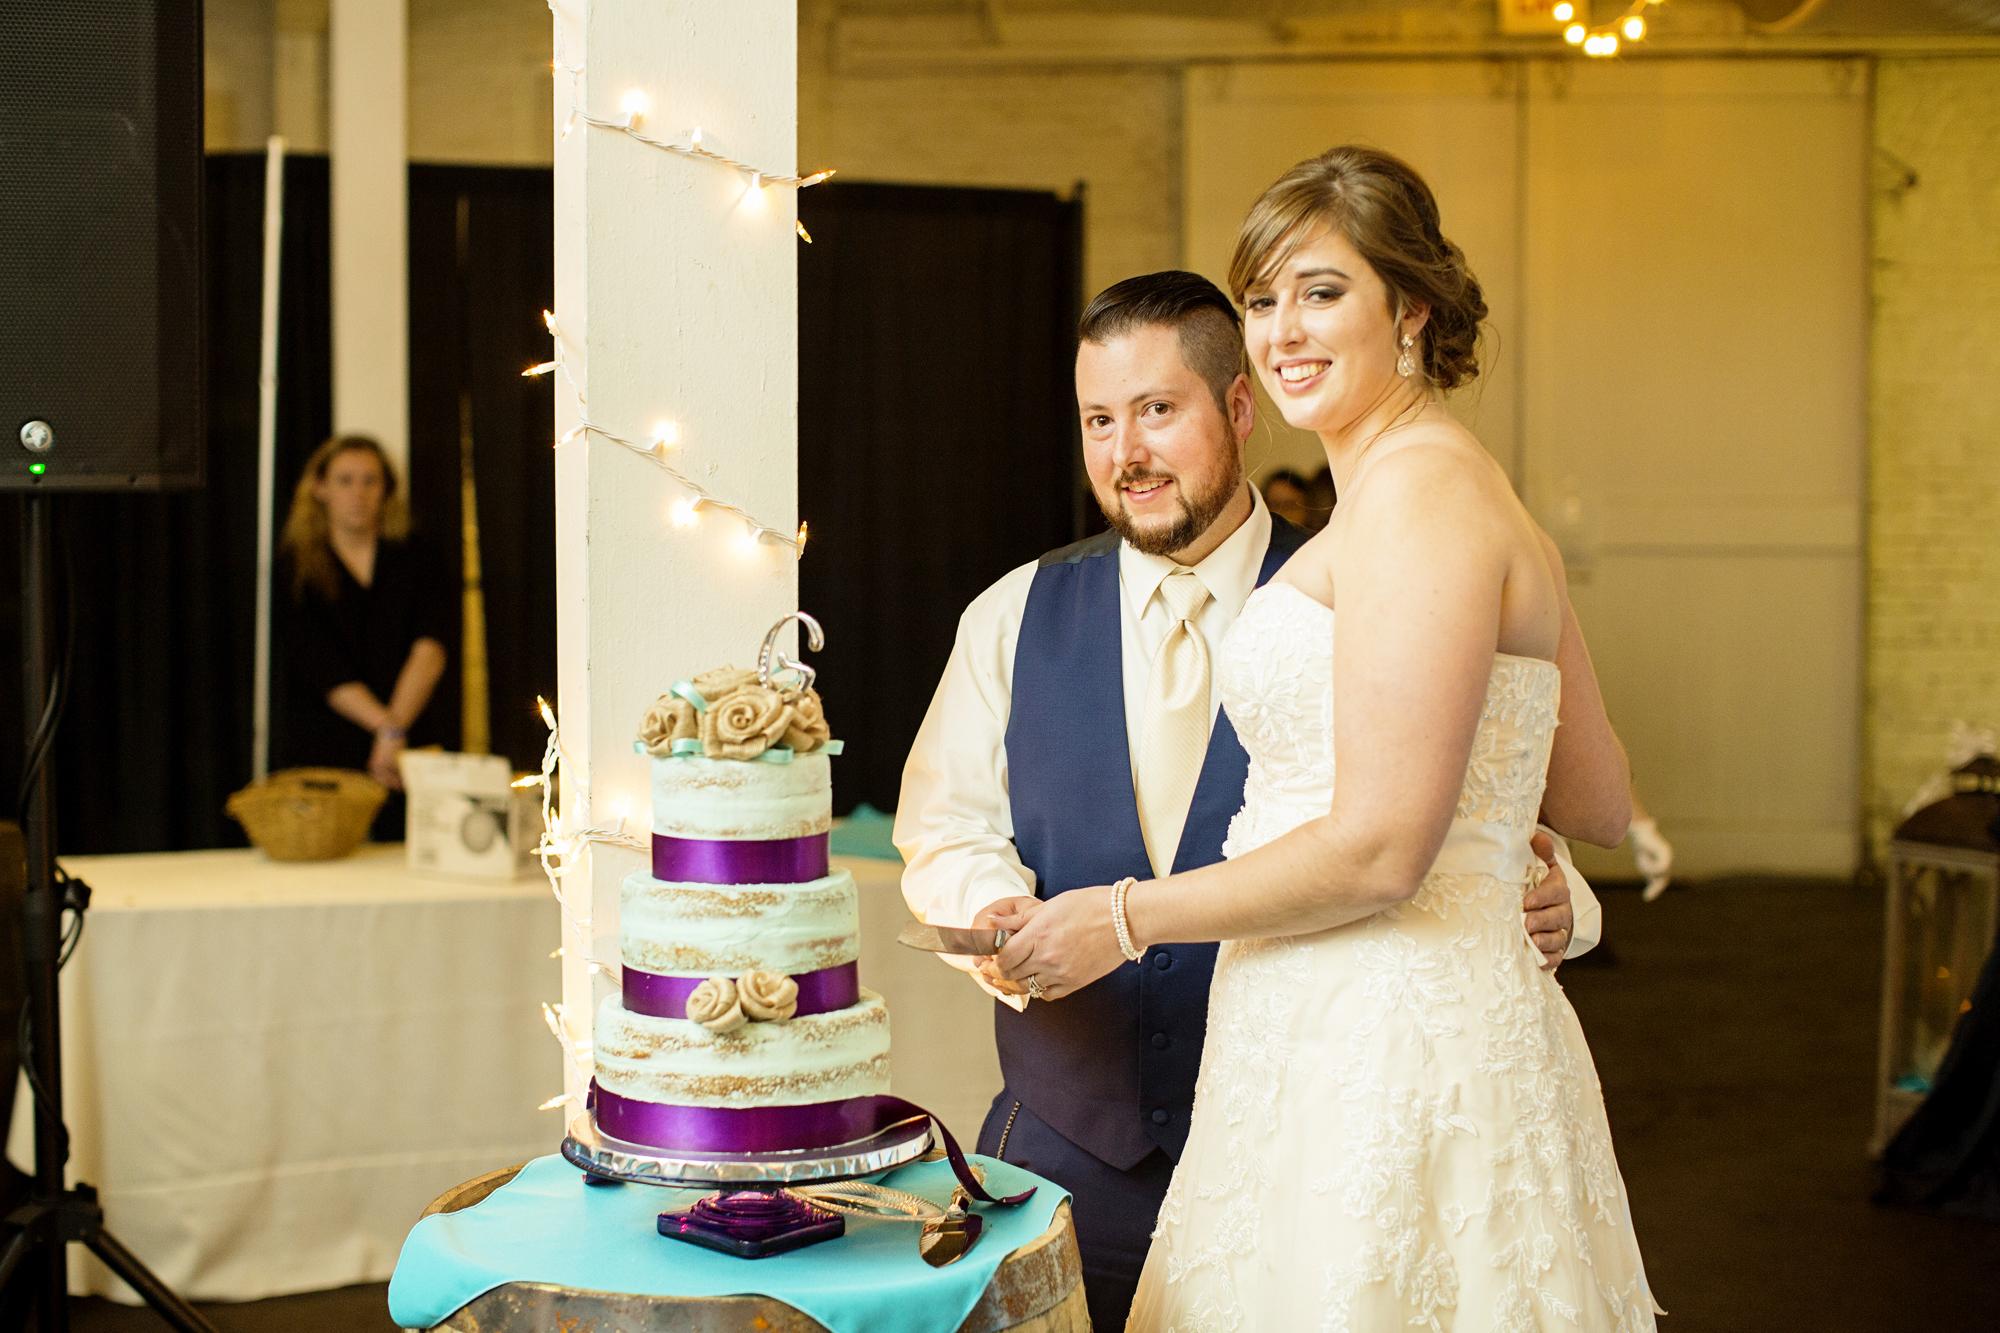 Seriously_Sabrina_Photography_Lexington_Kentucky_21c_Round_Barn_Red_Mile_Wedding_Gorley_108.jpg